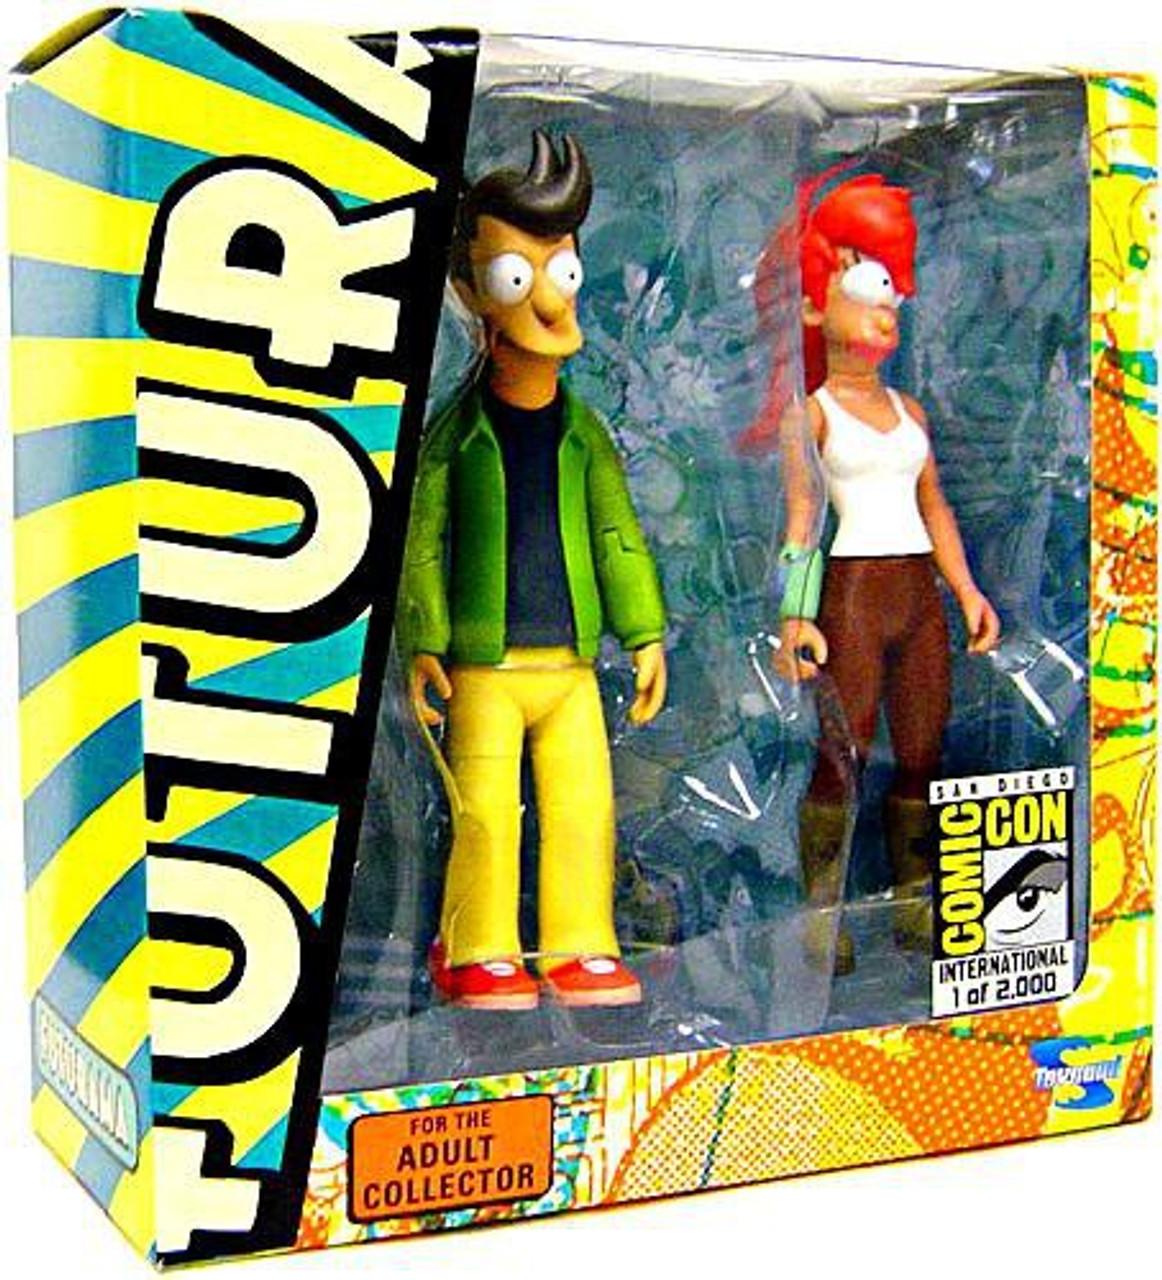 Futurama Alternate Universe Fry & Leela Exclusive Action Figure 2-Pack